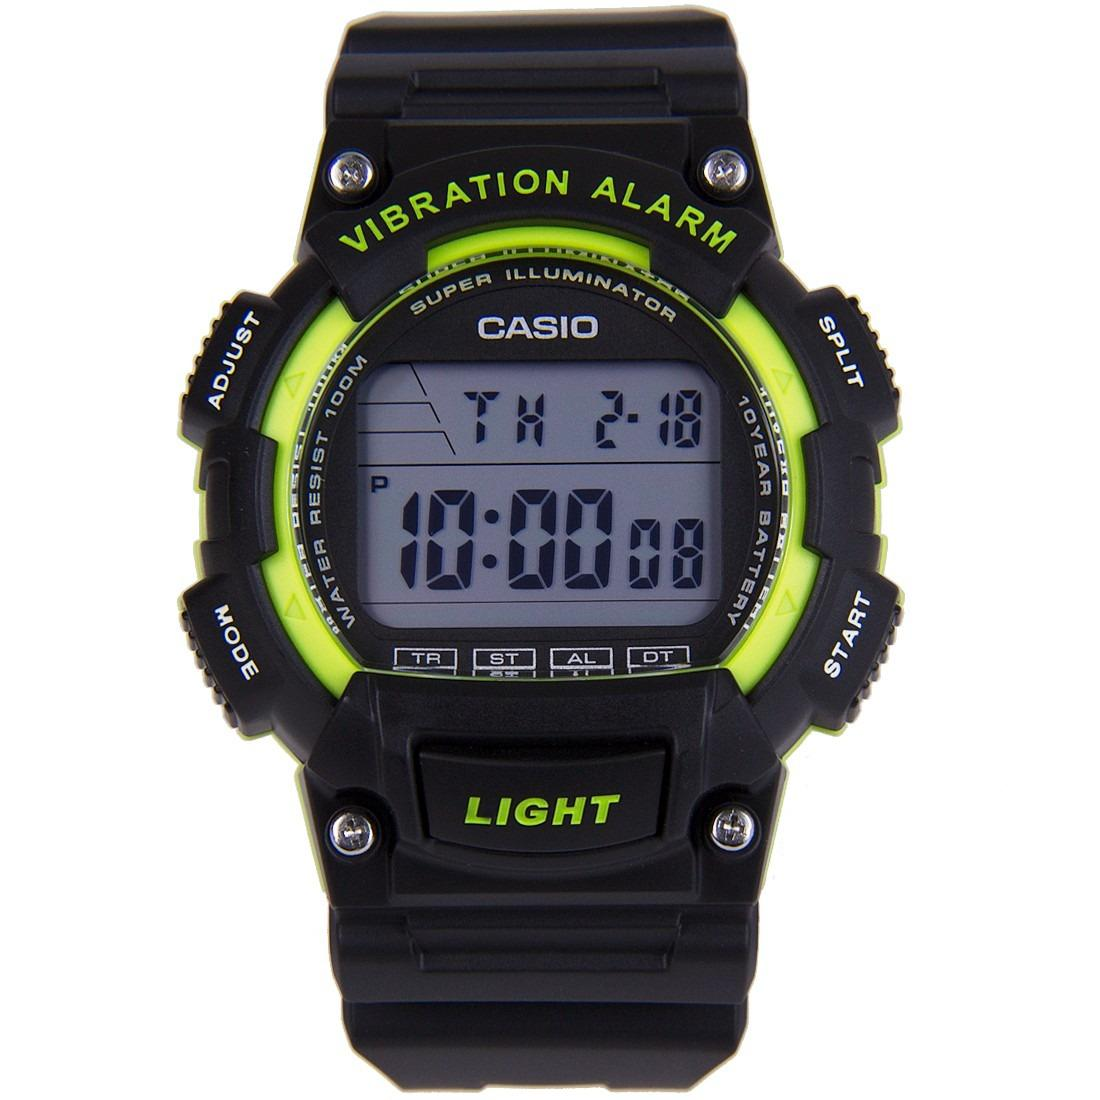 Best Buy Casio Super Illuminator Vibration Alarm Dual Time Digital Men S Black Resin Strap Watch W 736H 3Av